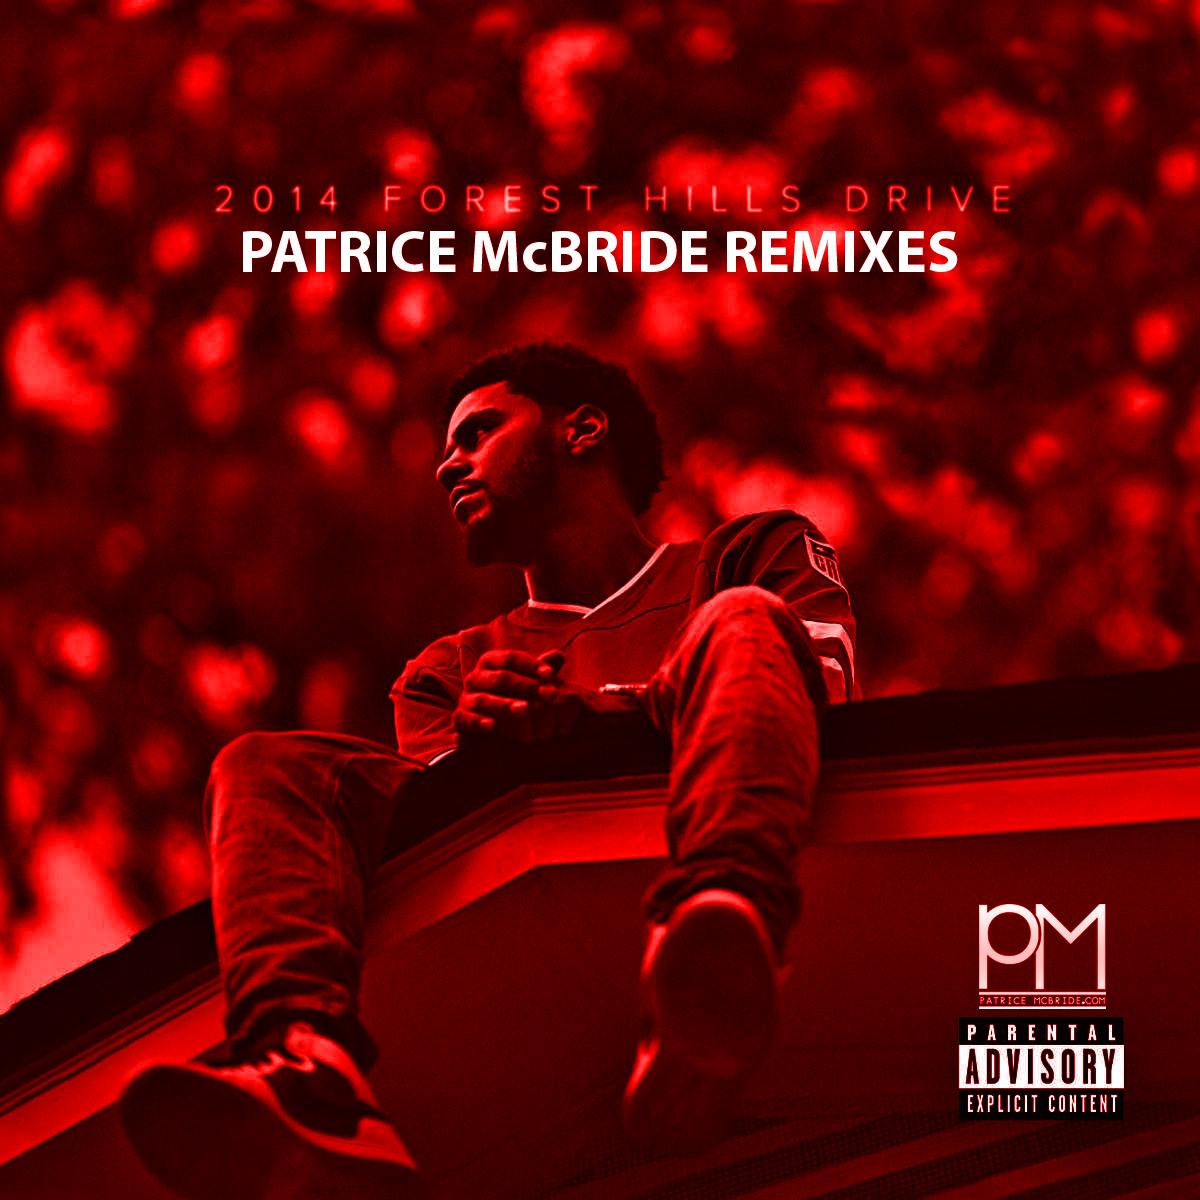 2014 Forest Hills Drive (Patrice McBride Remixes)